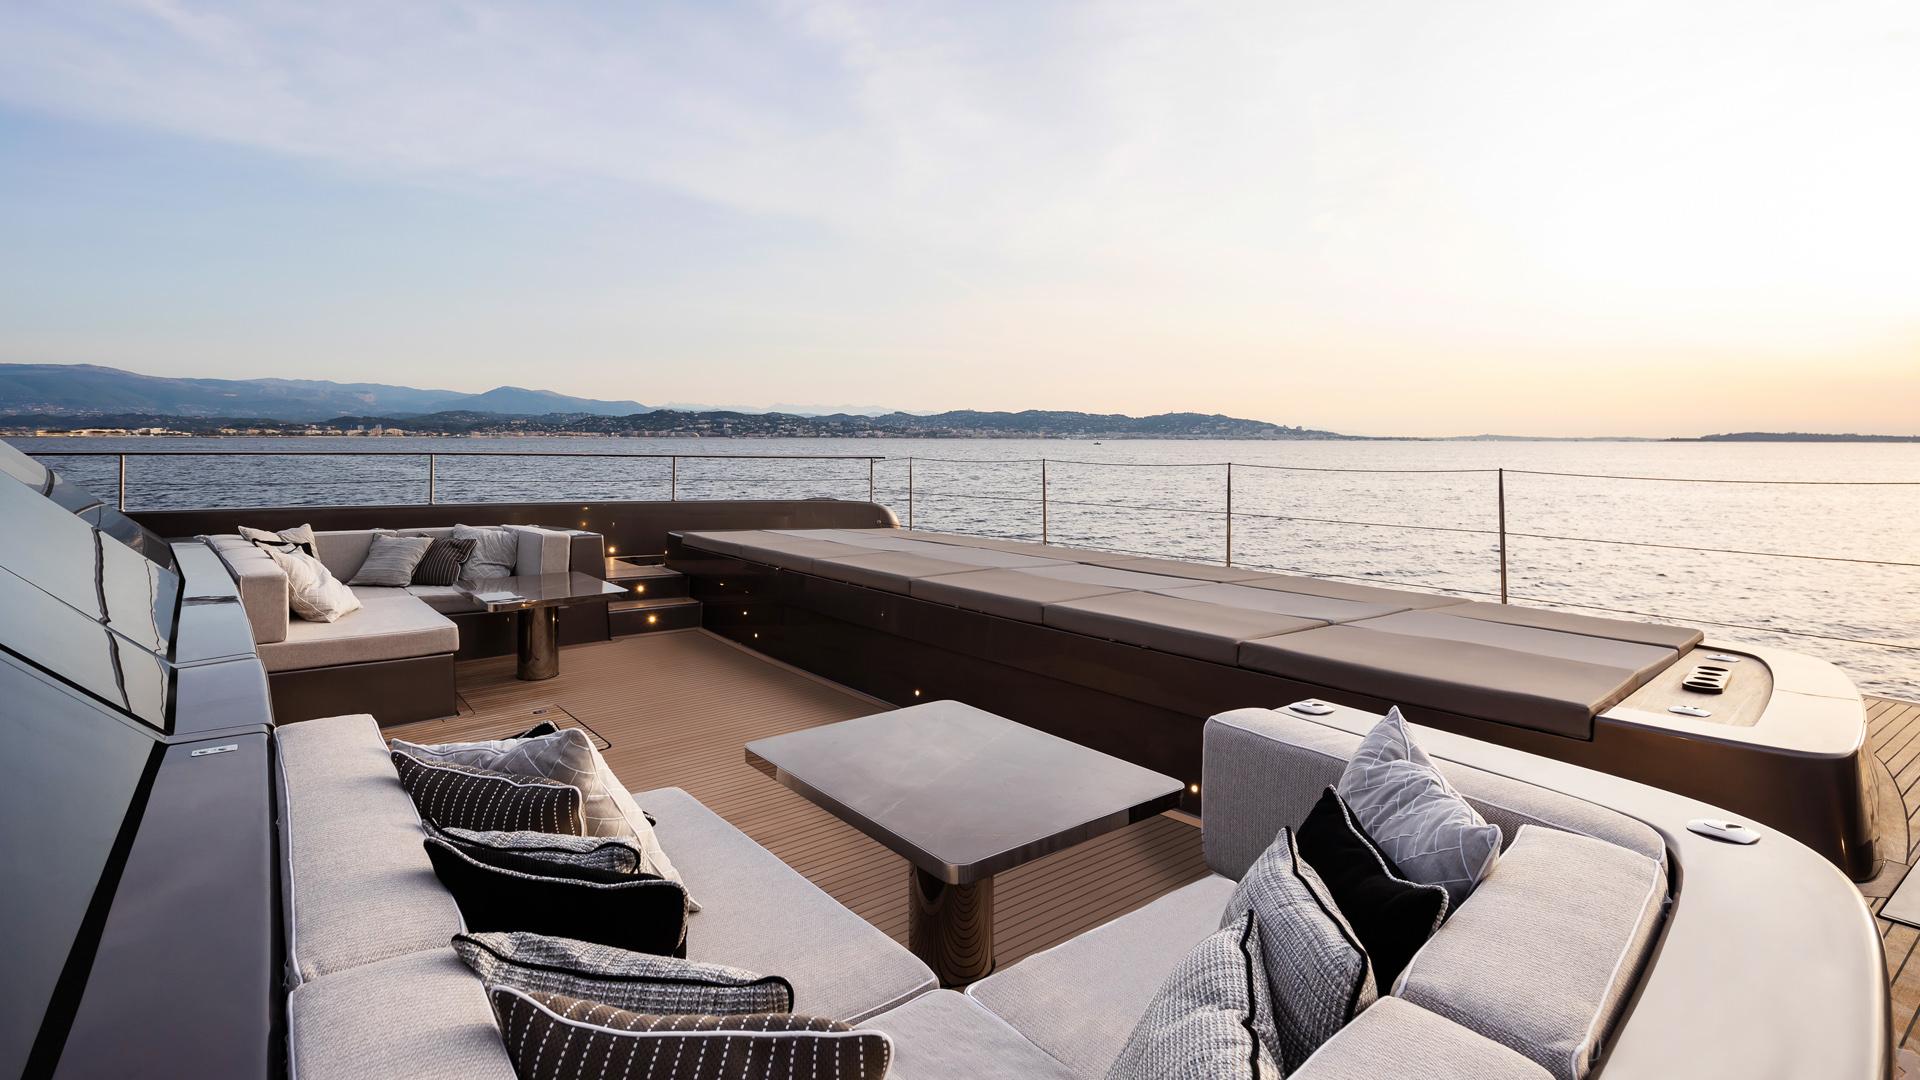 Luxury custom yachts, catamarans, power boats design, construction